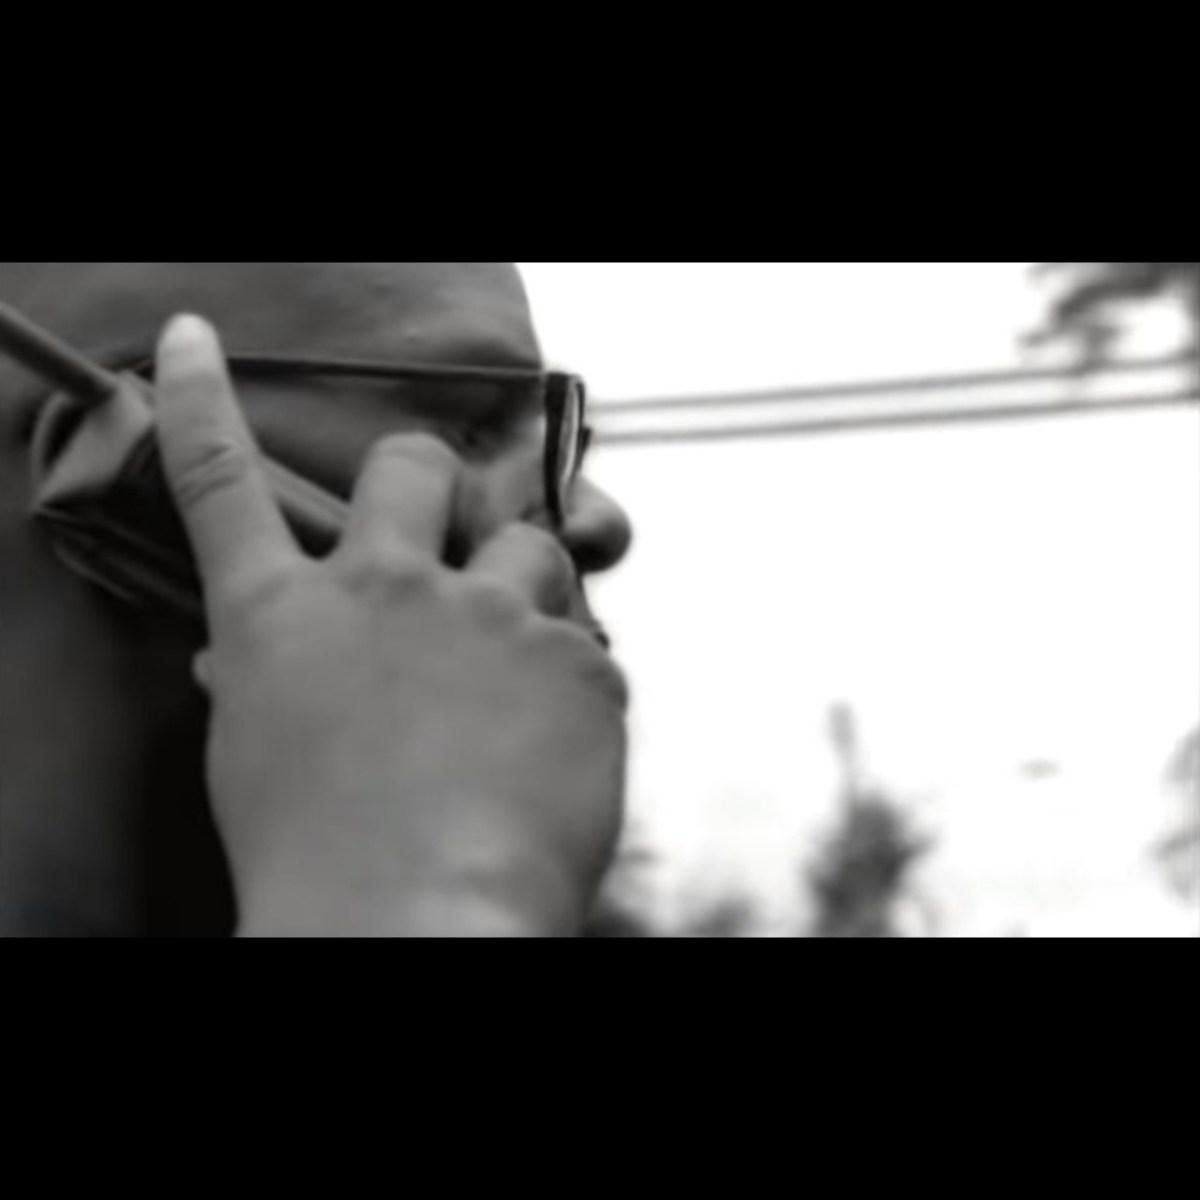 R. Kelly - I Can't Sleep Baby (If I) (Remix) (Thumbnail)